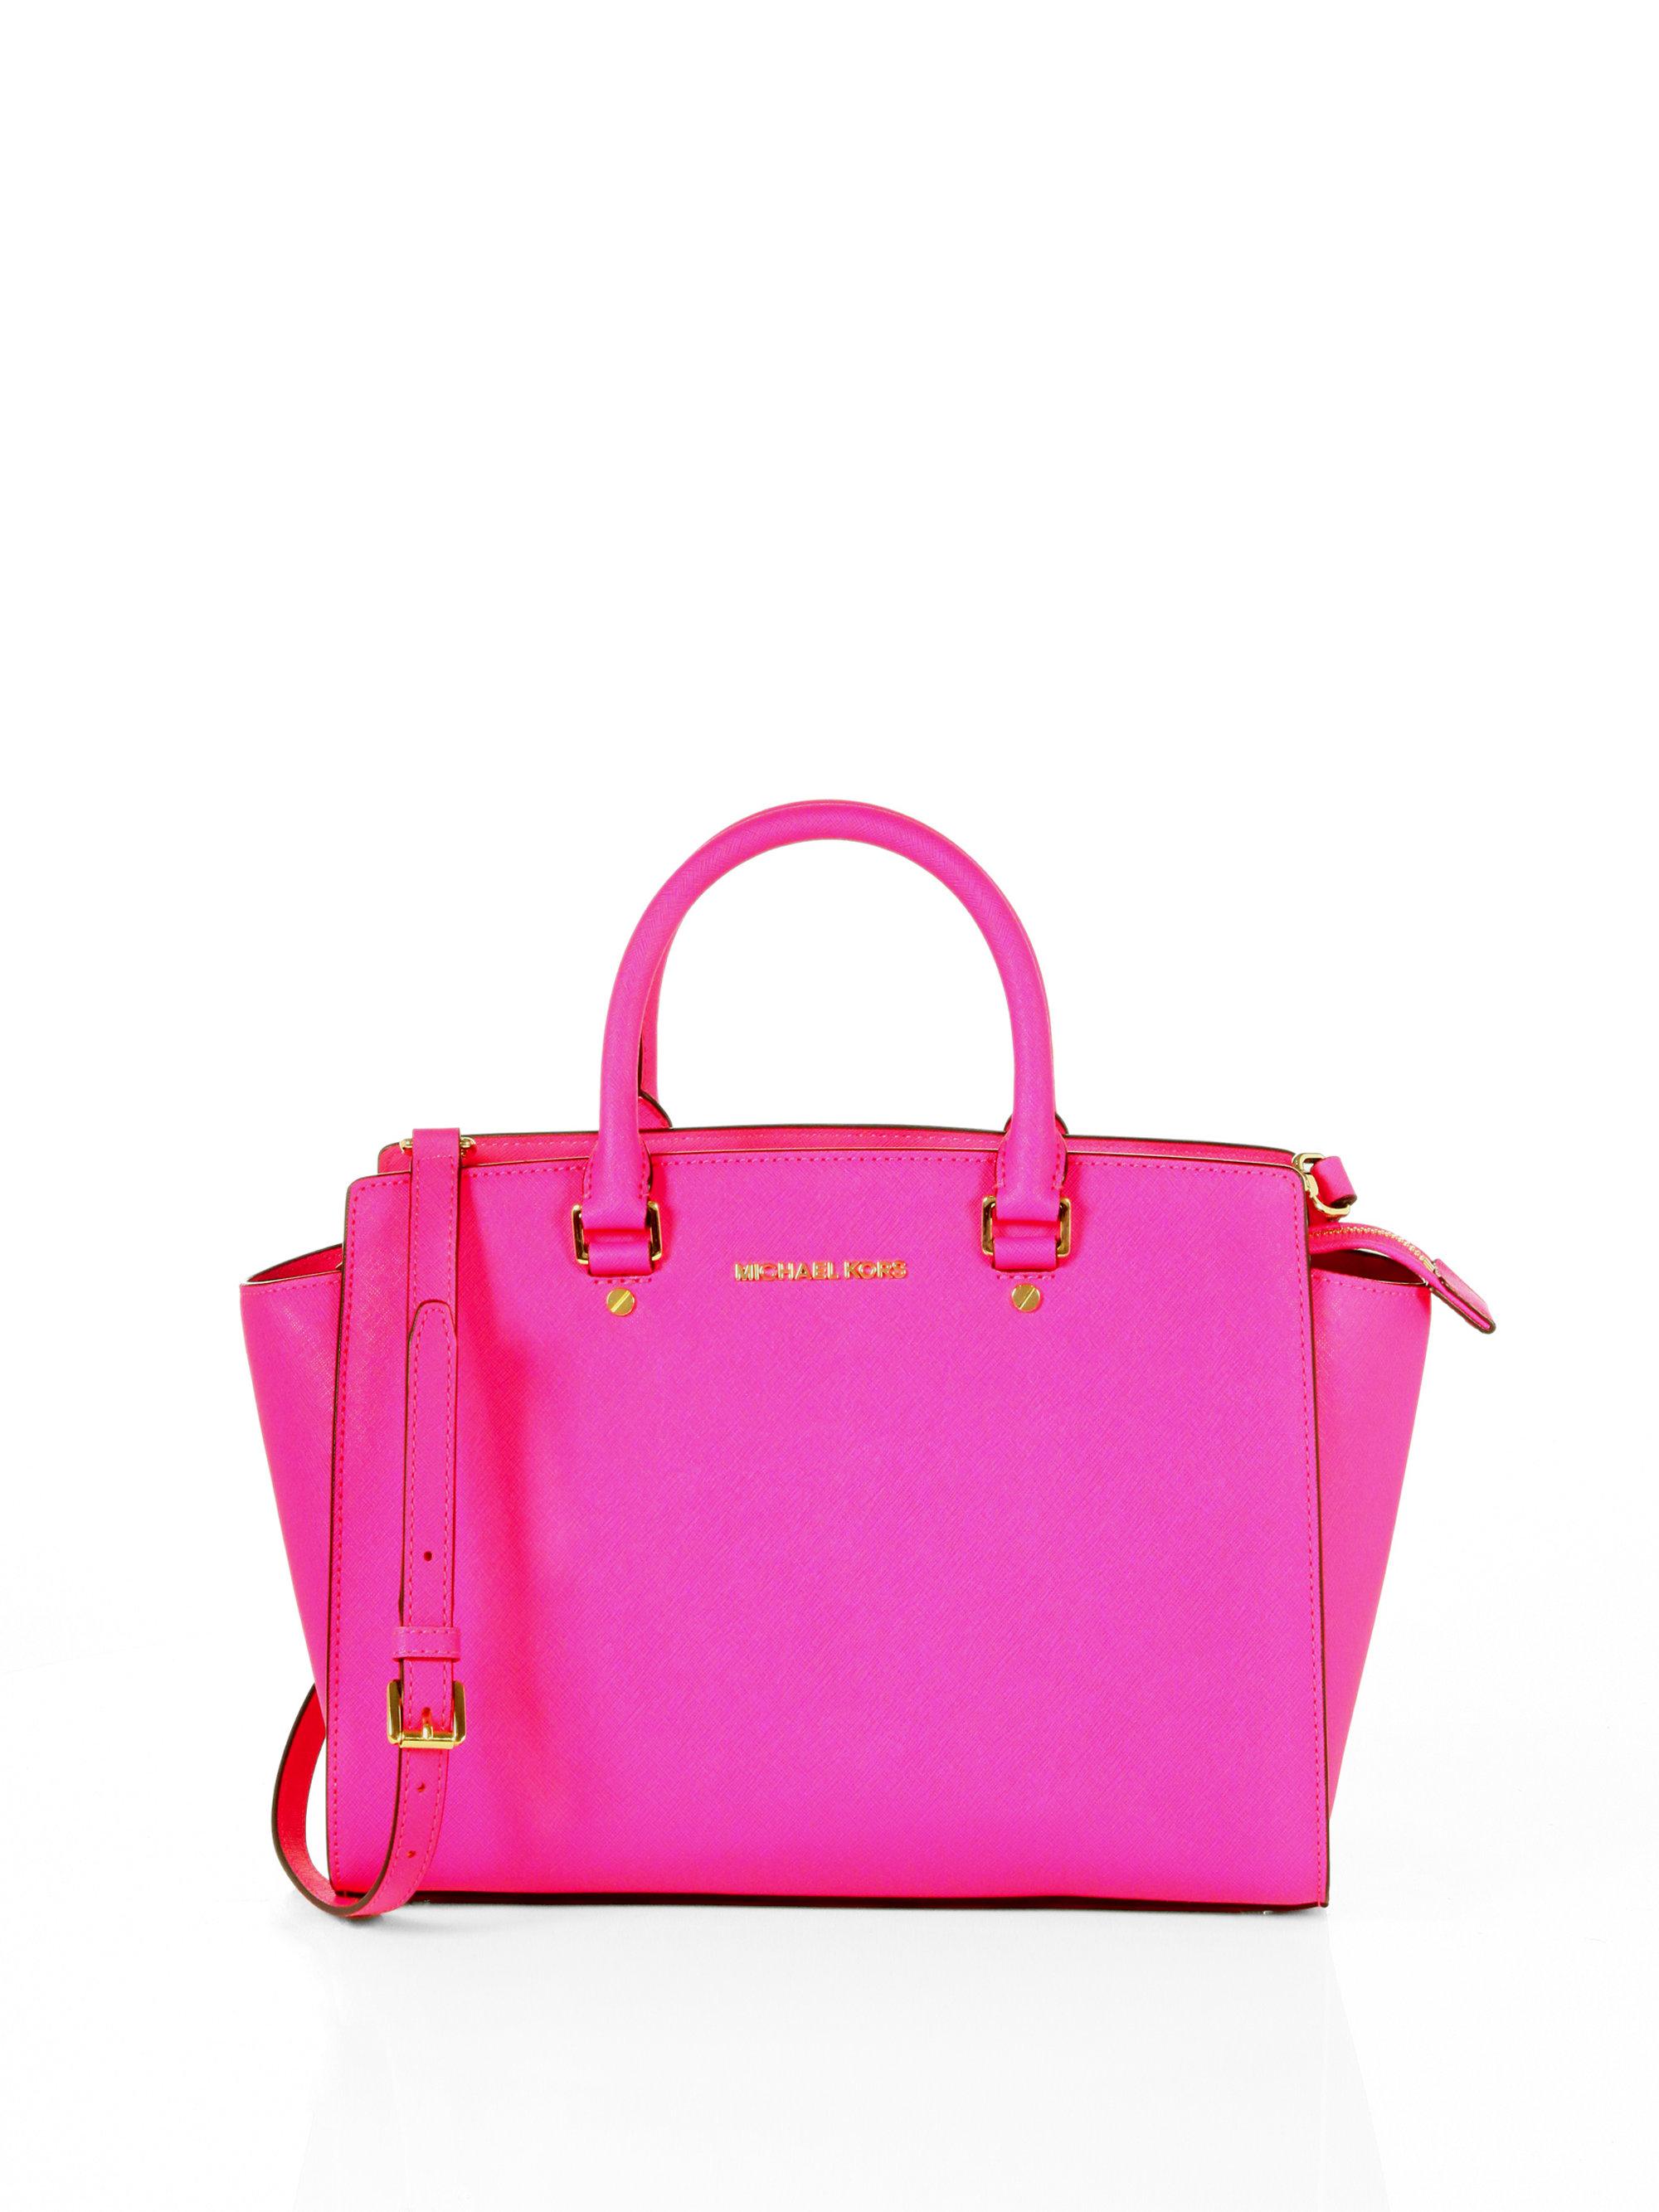 michael michael kors selma large satchel in pink neon. Black Bedroom Furniture Sets. Home Design Ideas